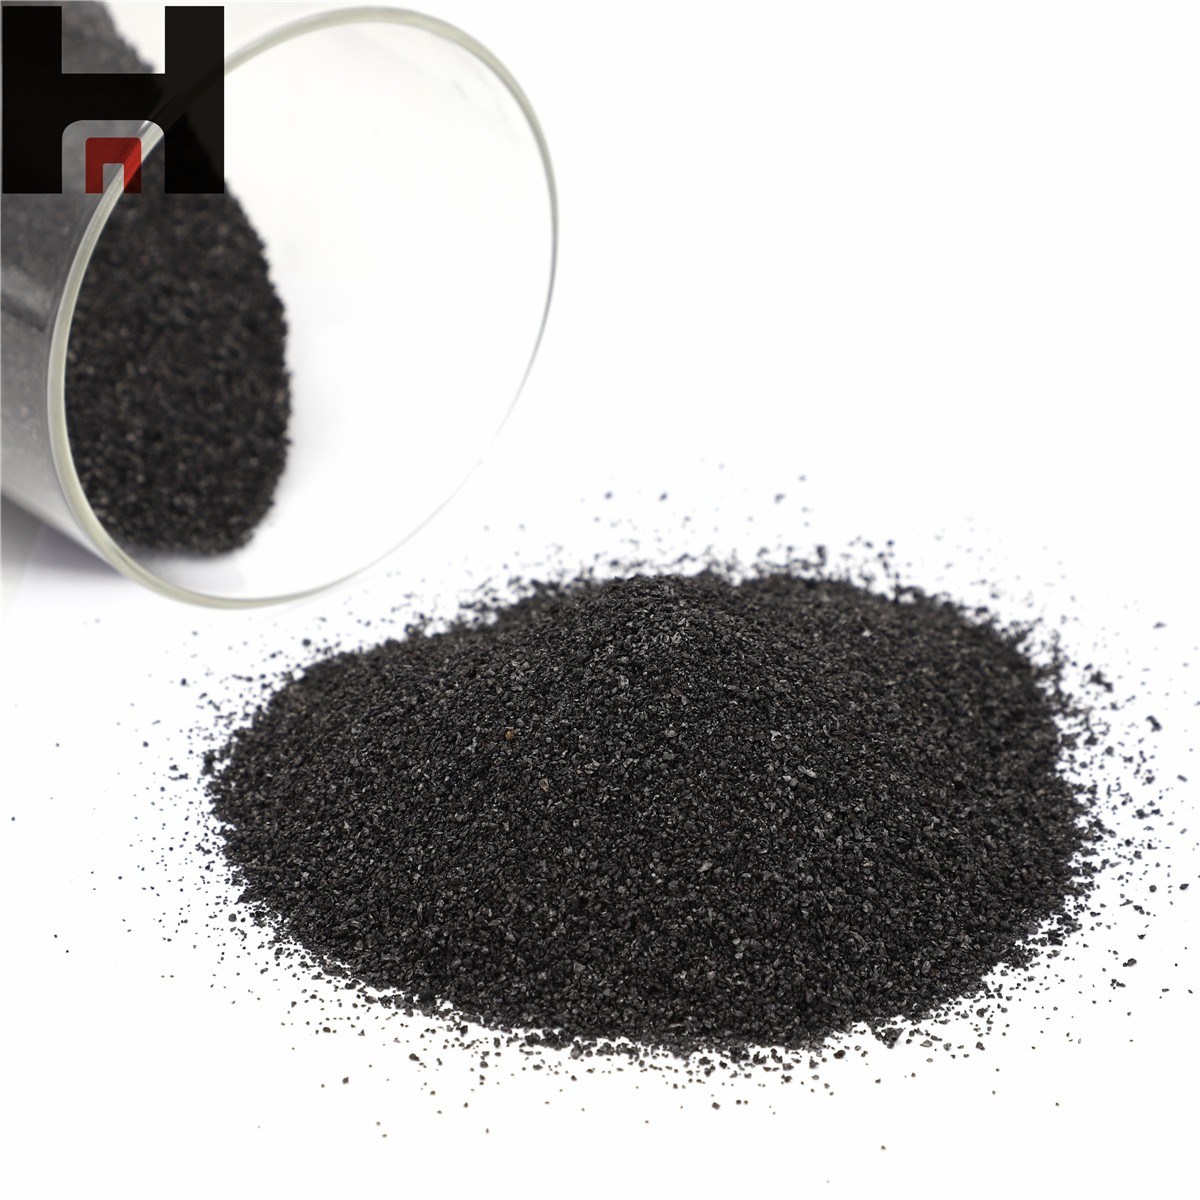 High Carbon Graphite Carbon Raiser GPC Manufacturers, High Carbon Graphite Carbon Raiser GPC Factory, Supply High Carbon Graphite Carbon Raiser GPC